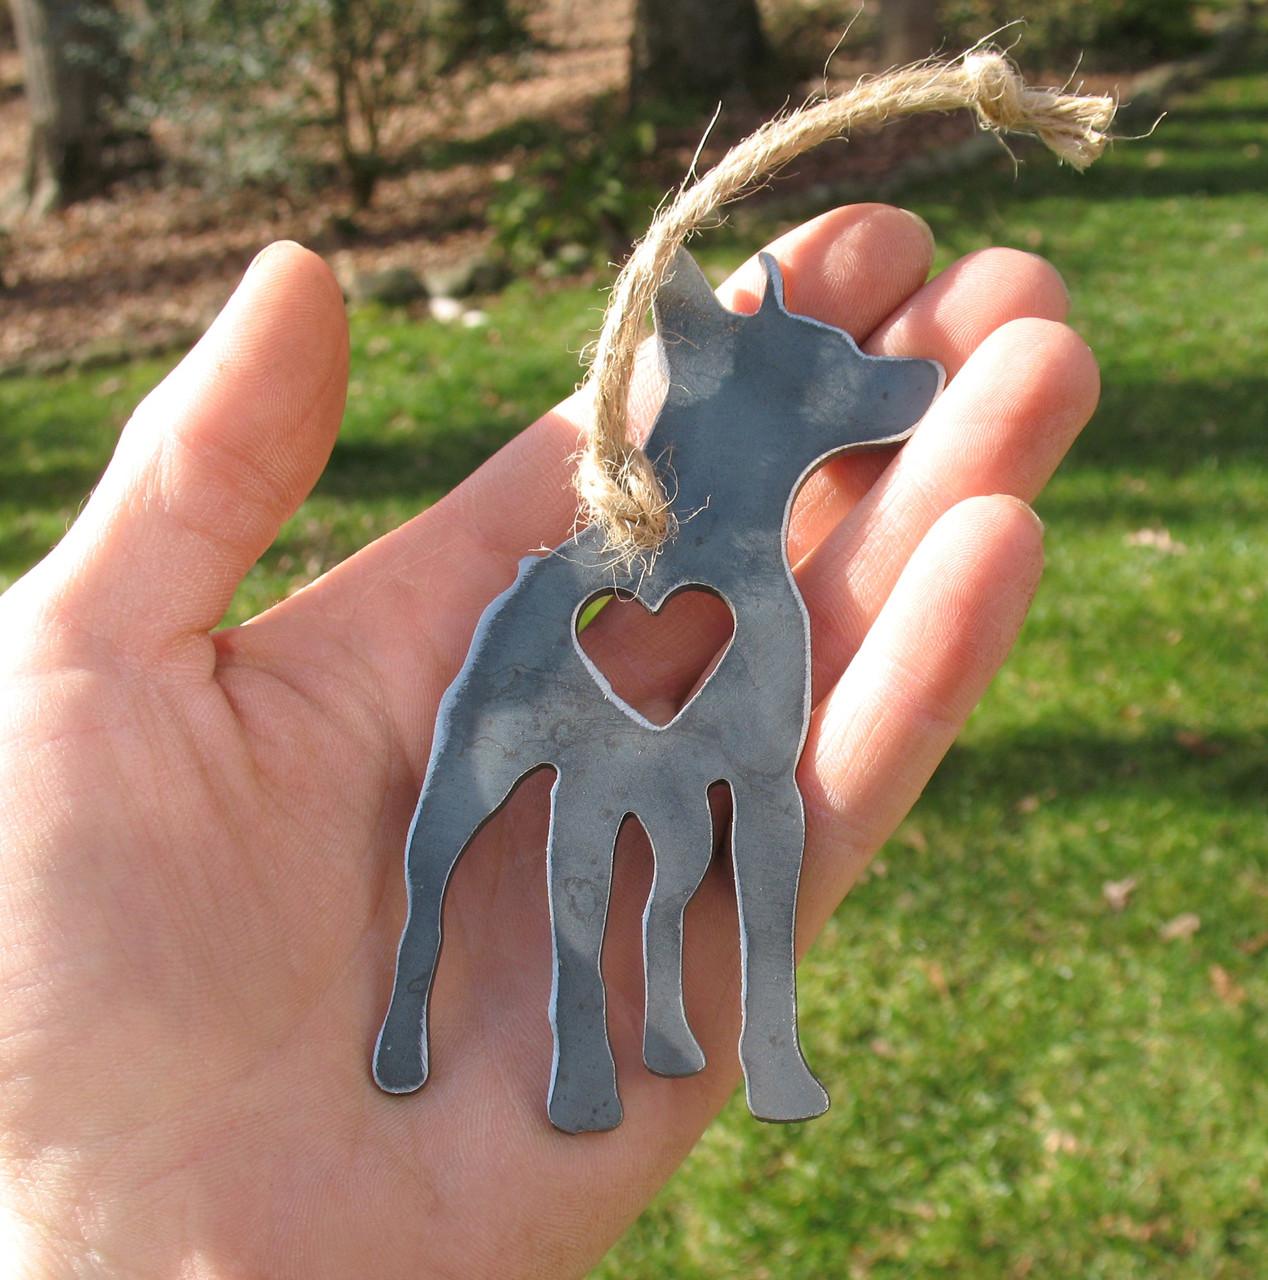 Miniature Pinscher Dog Ornament - Metal Dog Christmas Ornament - Pet Lover Memorial Ornament Pet Loss Dog Memorial Ornament Remembrance Gift